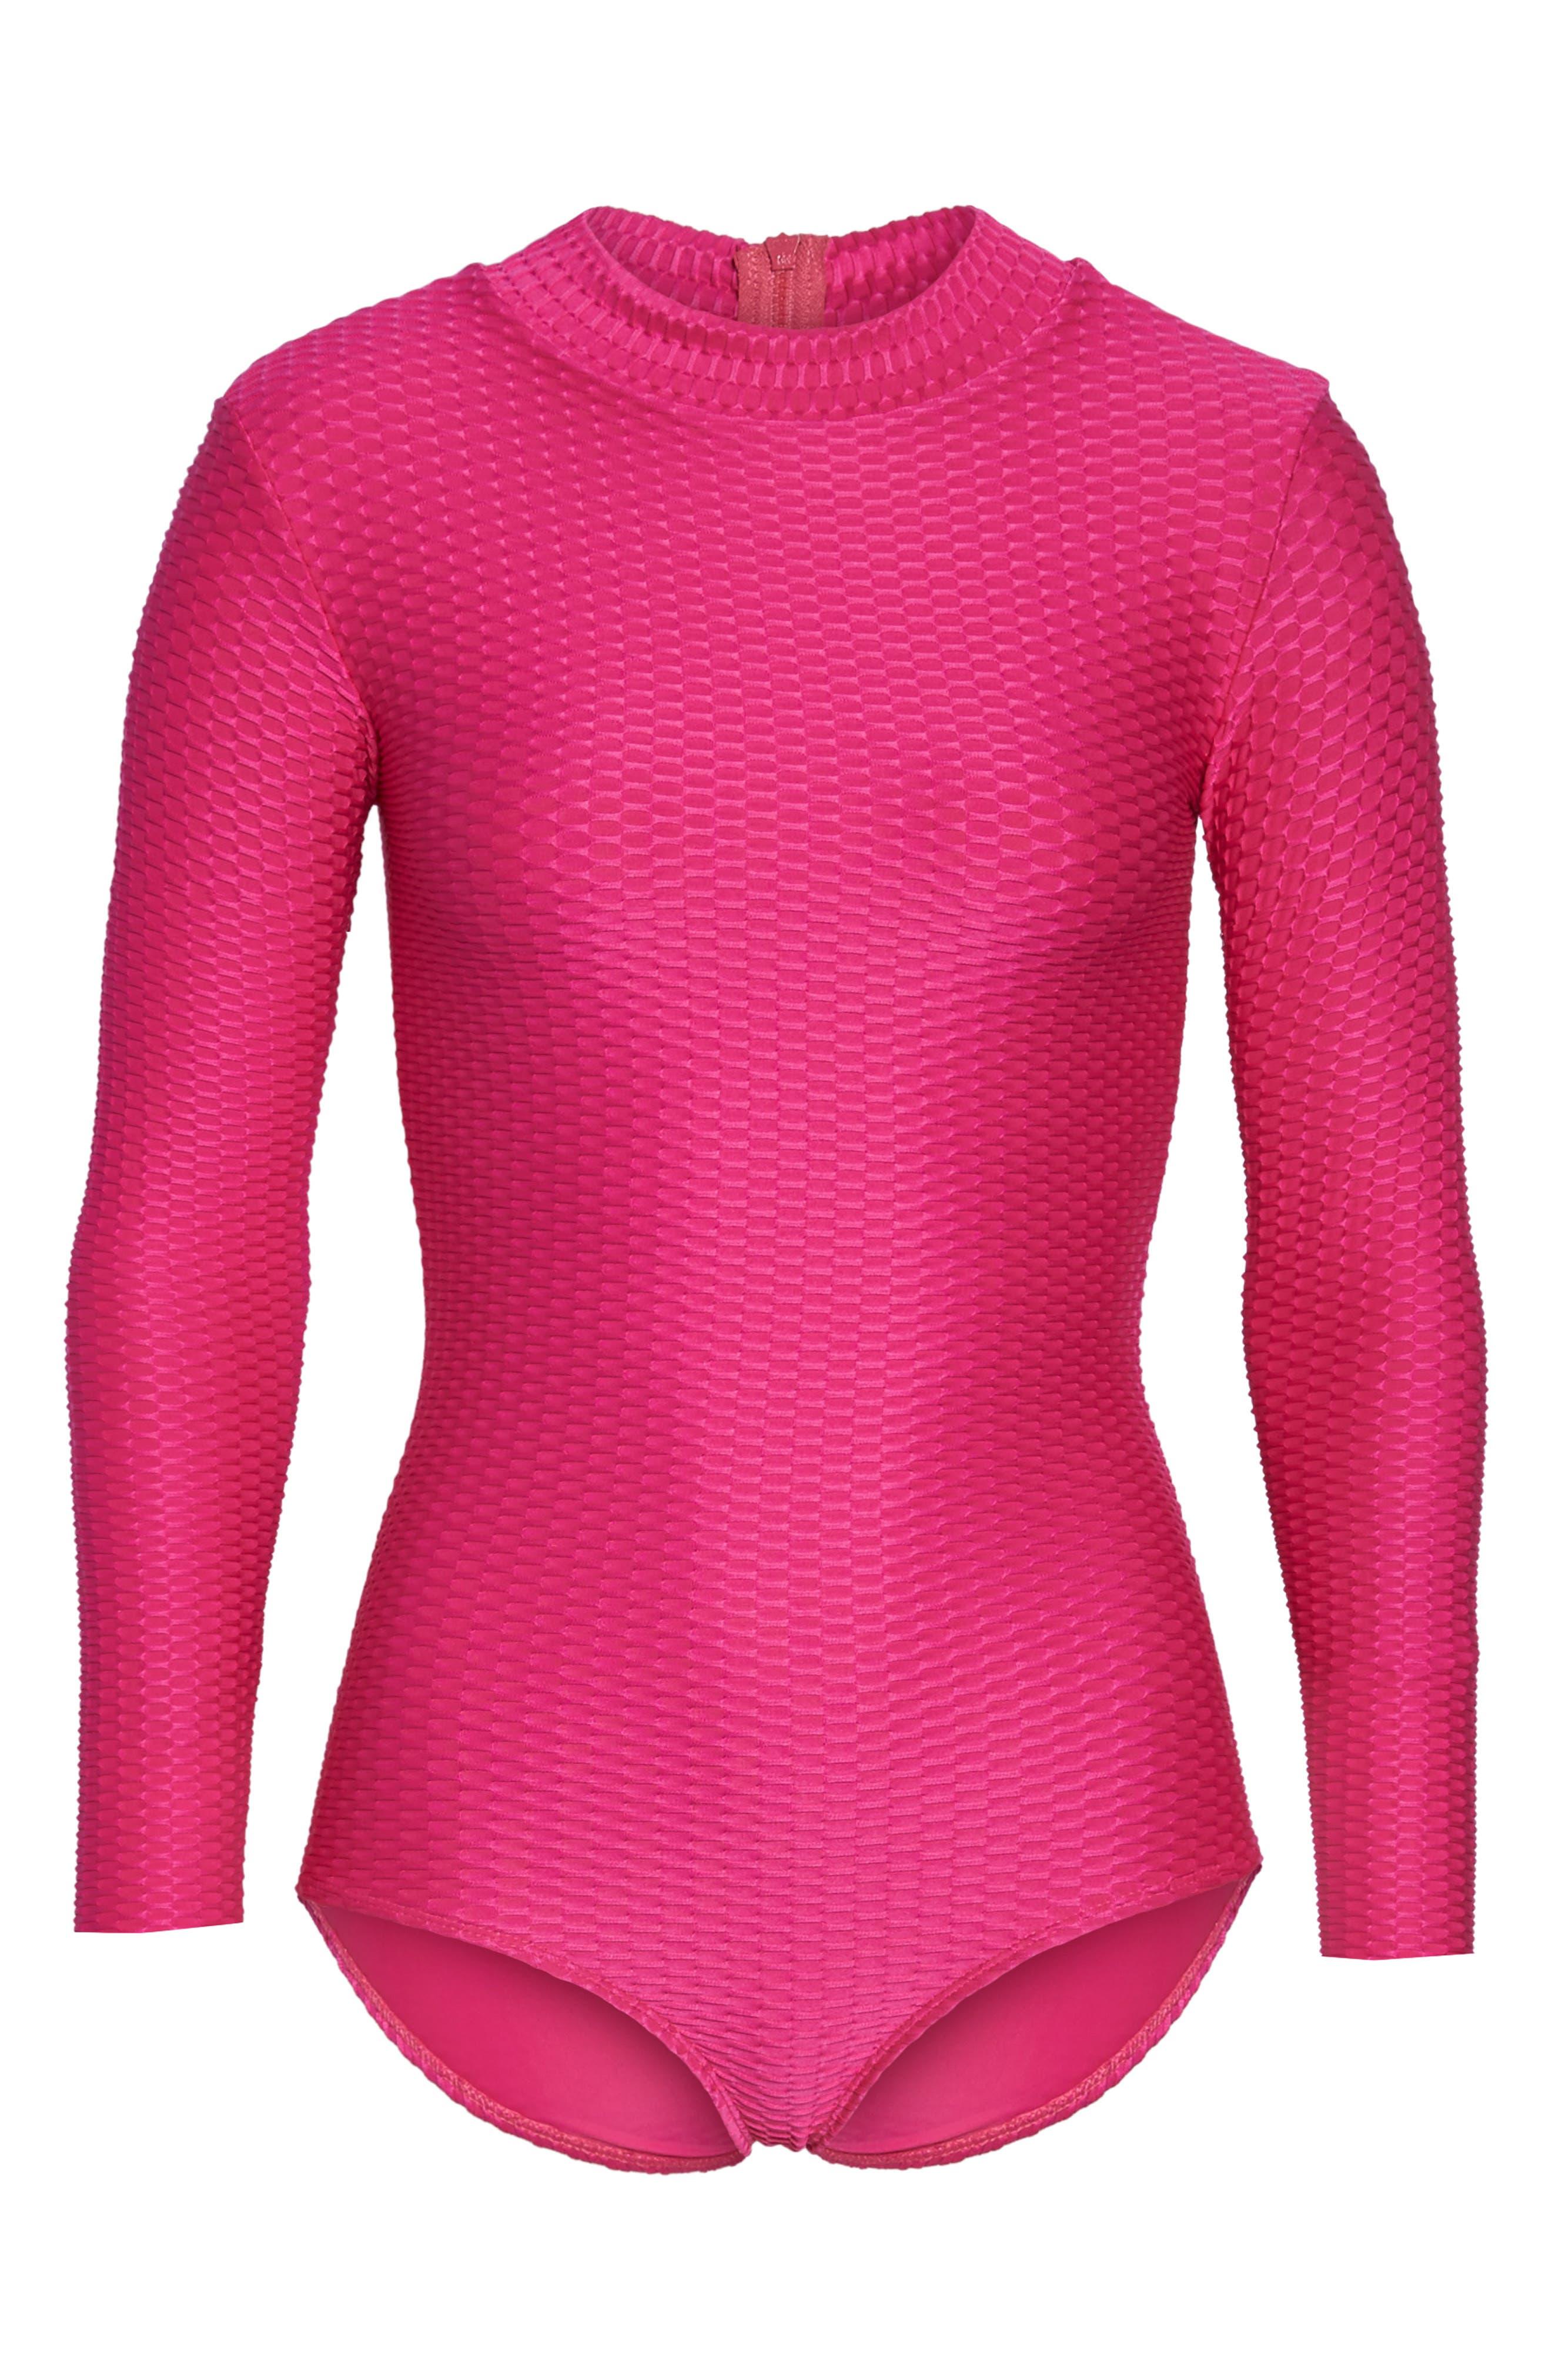 Long Sleeve One-Piece Swimsuit,                             Alternate thumbnail 6, color,                             Fuchsia